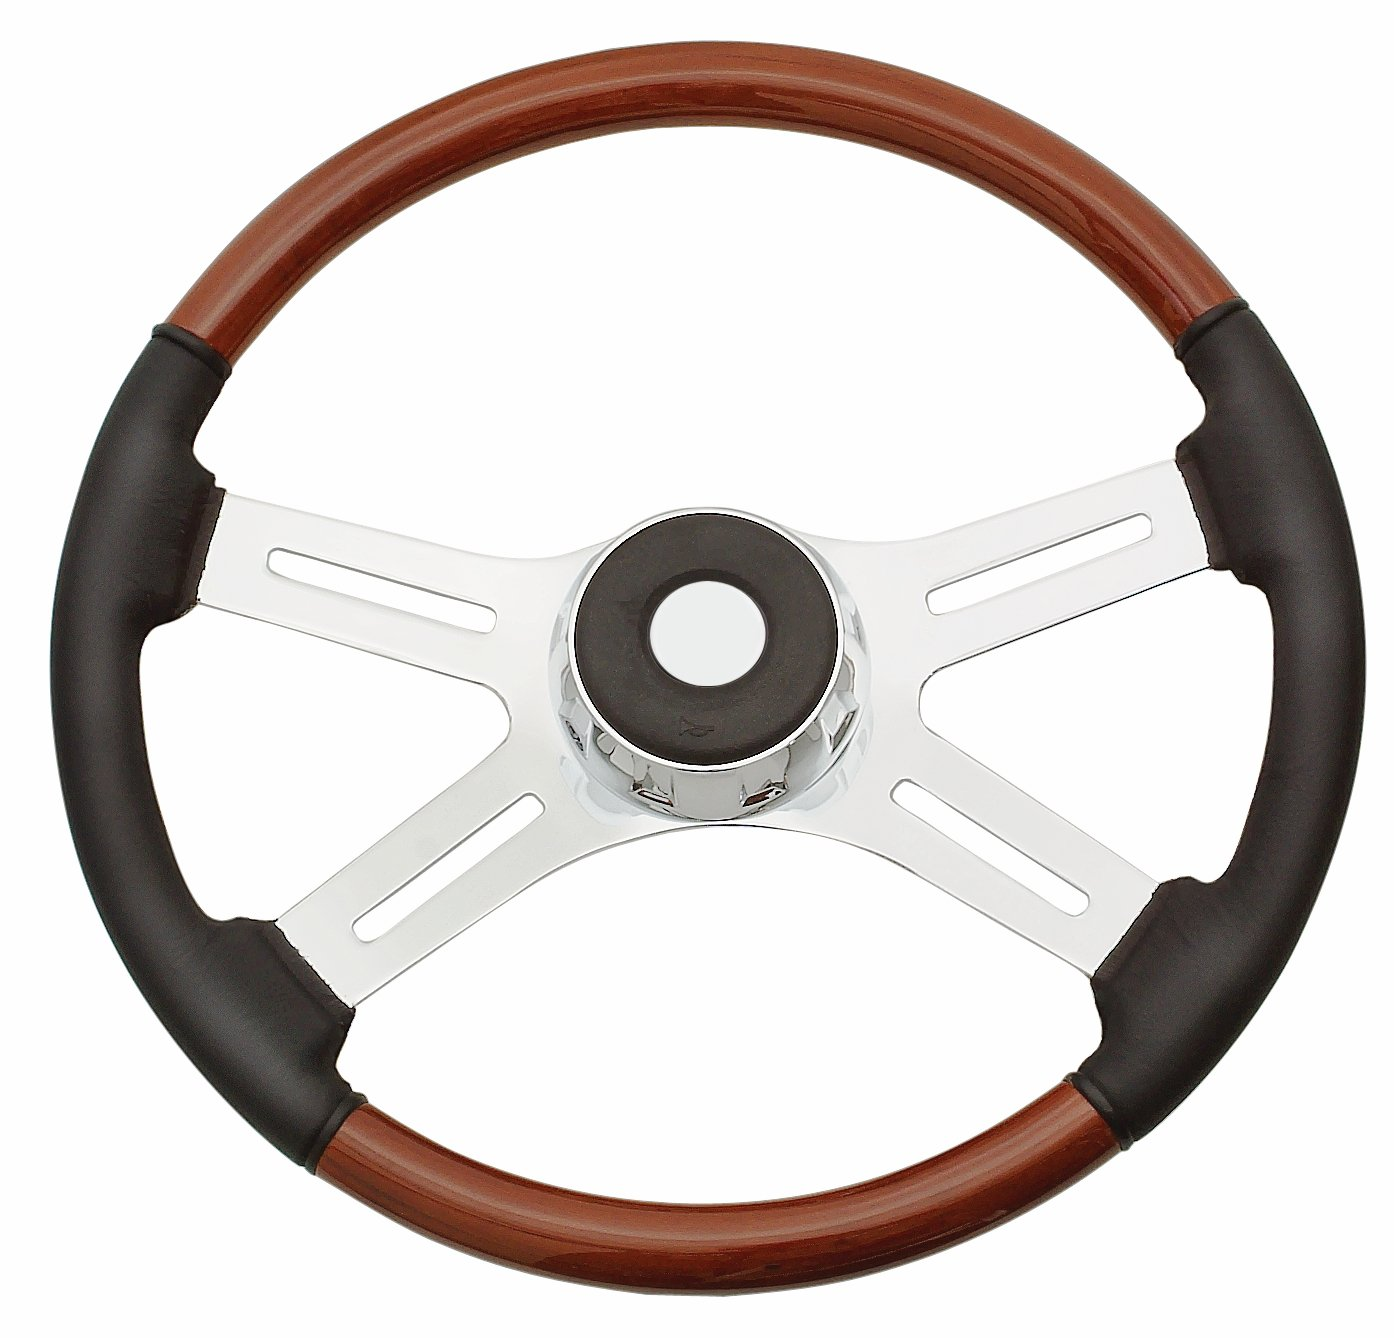 Woody's WP-SWF8901L Rosewood Chrome Truck Steering Wheel (Beautiful African Hardwood)